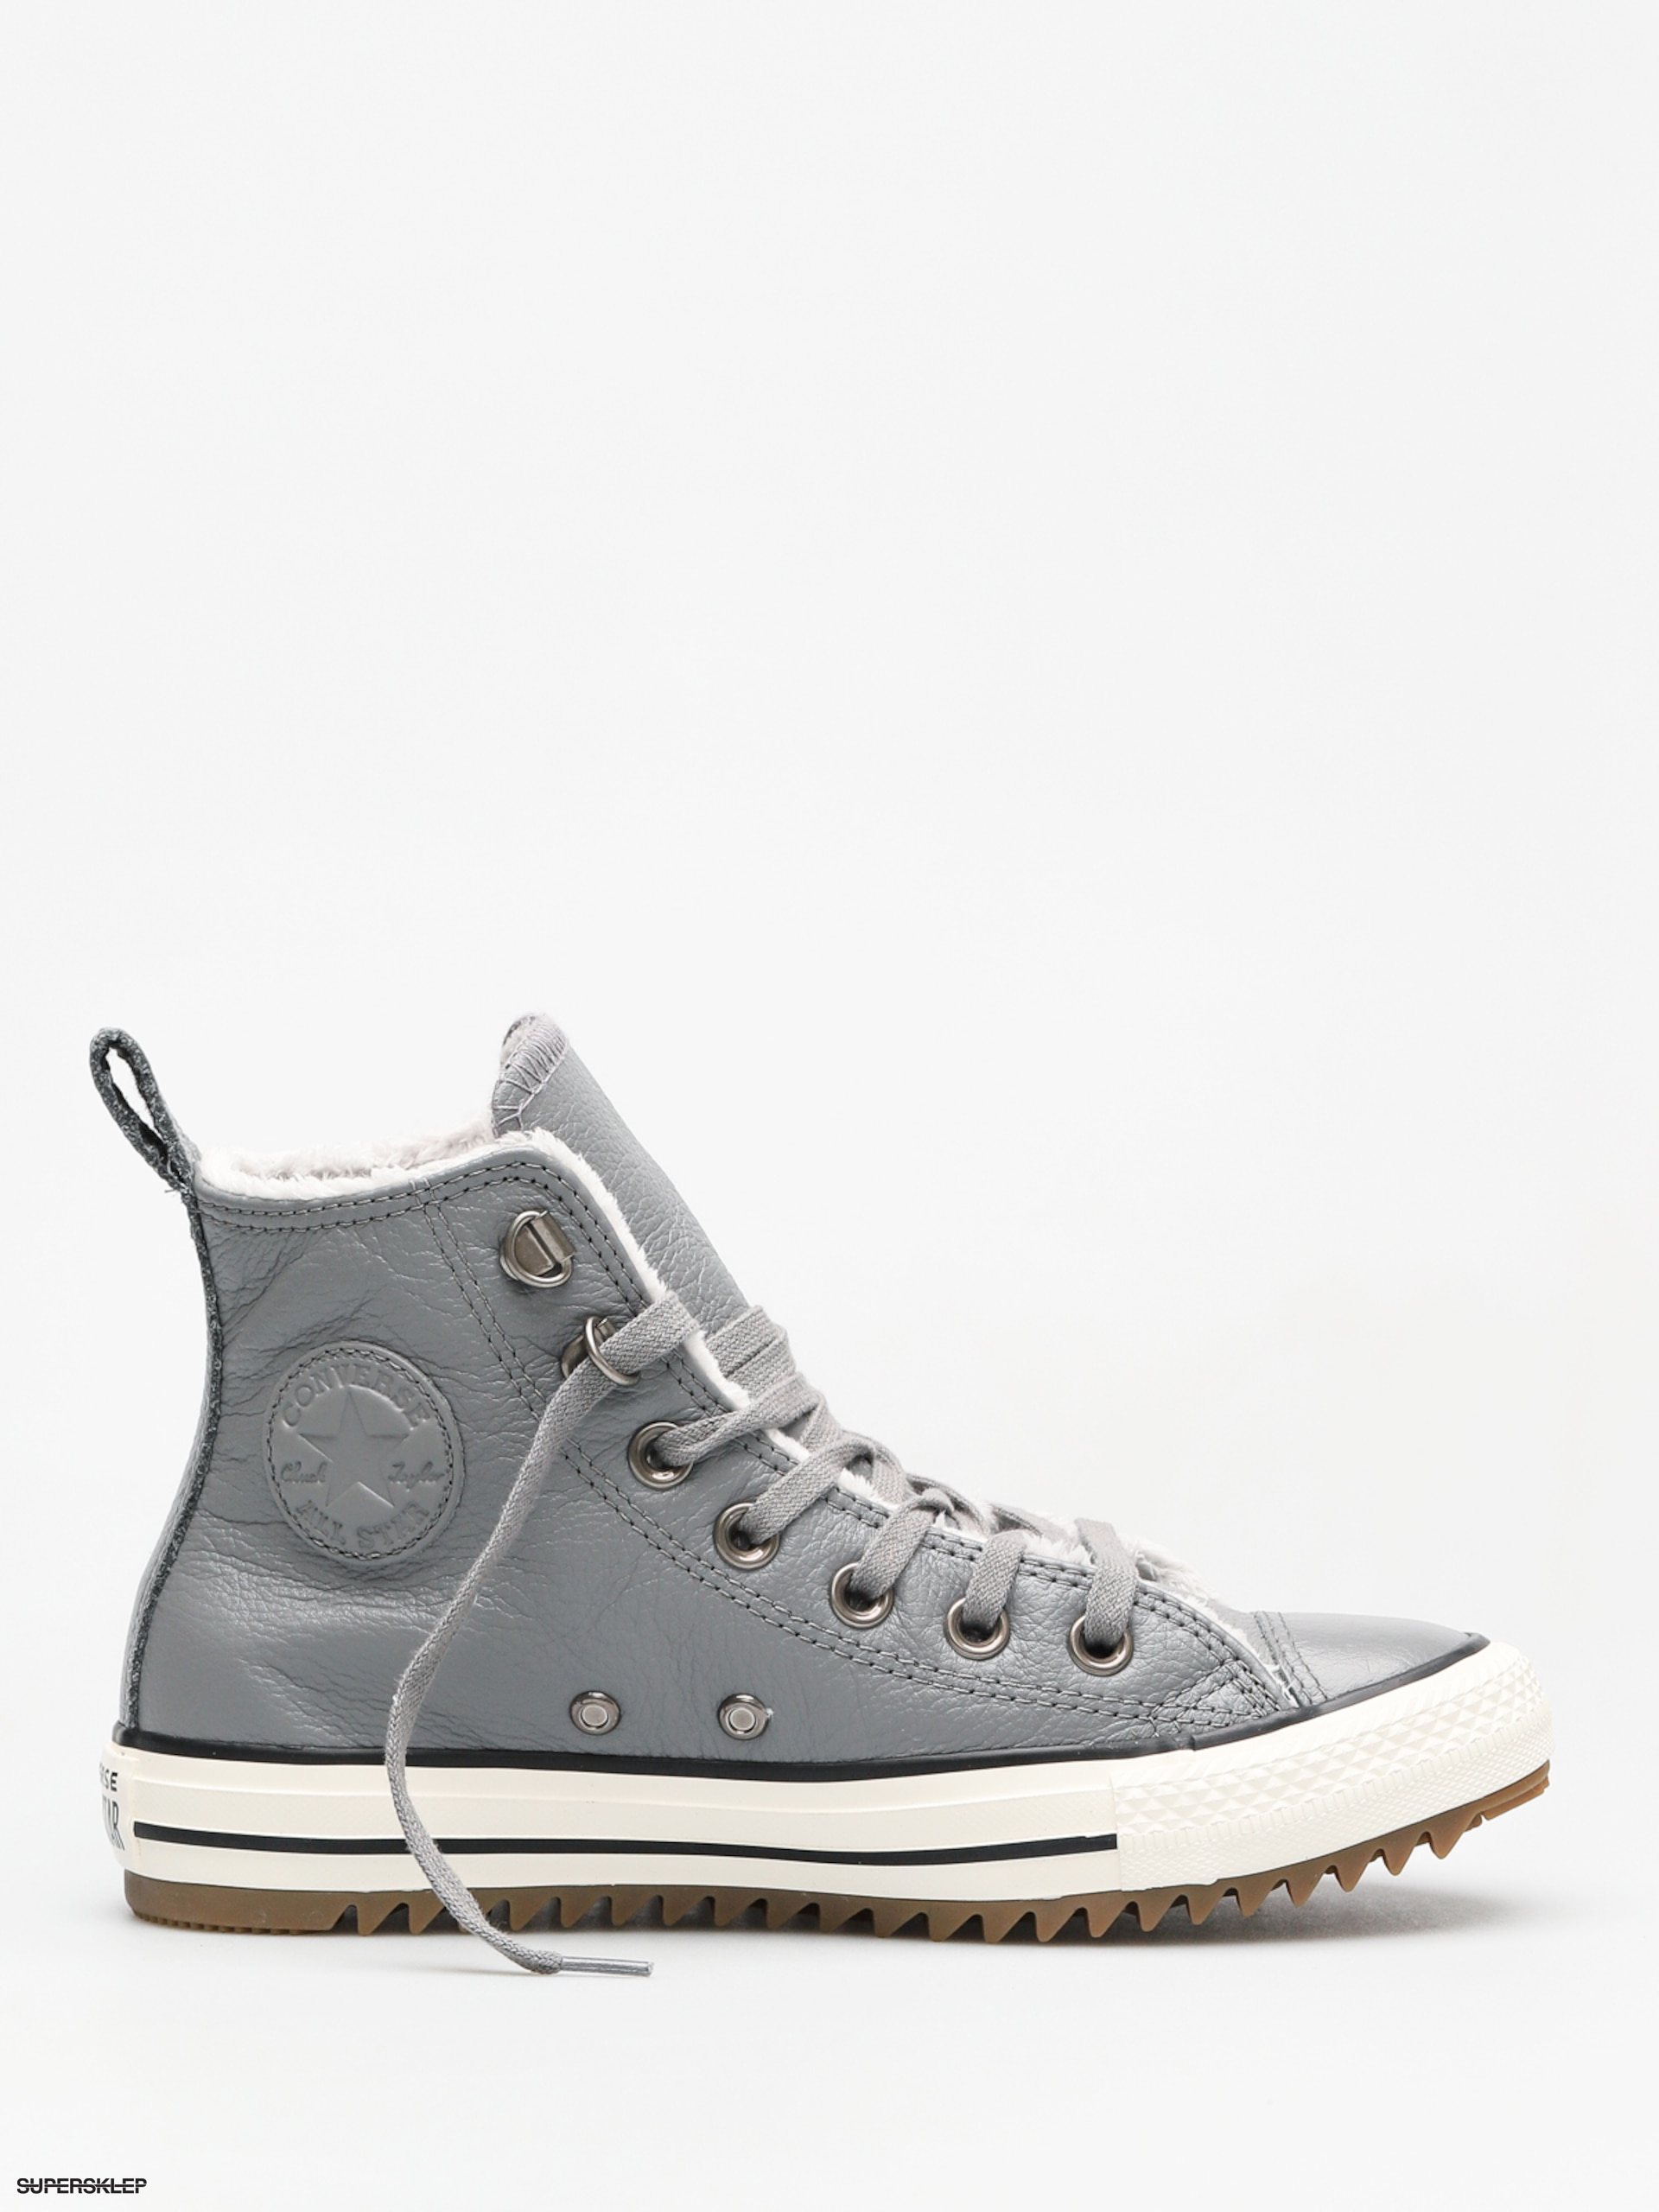 a83bab9f356 Trampki Converse Chuck Taylor All Star Hiker Boot Hi (mason egret gum)